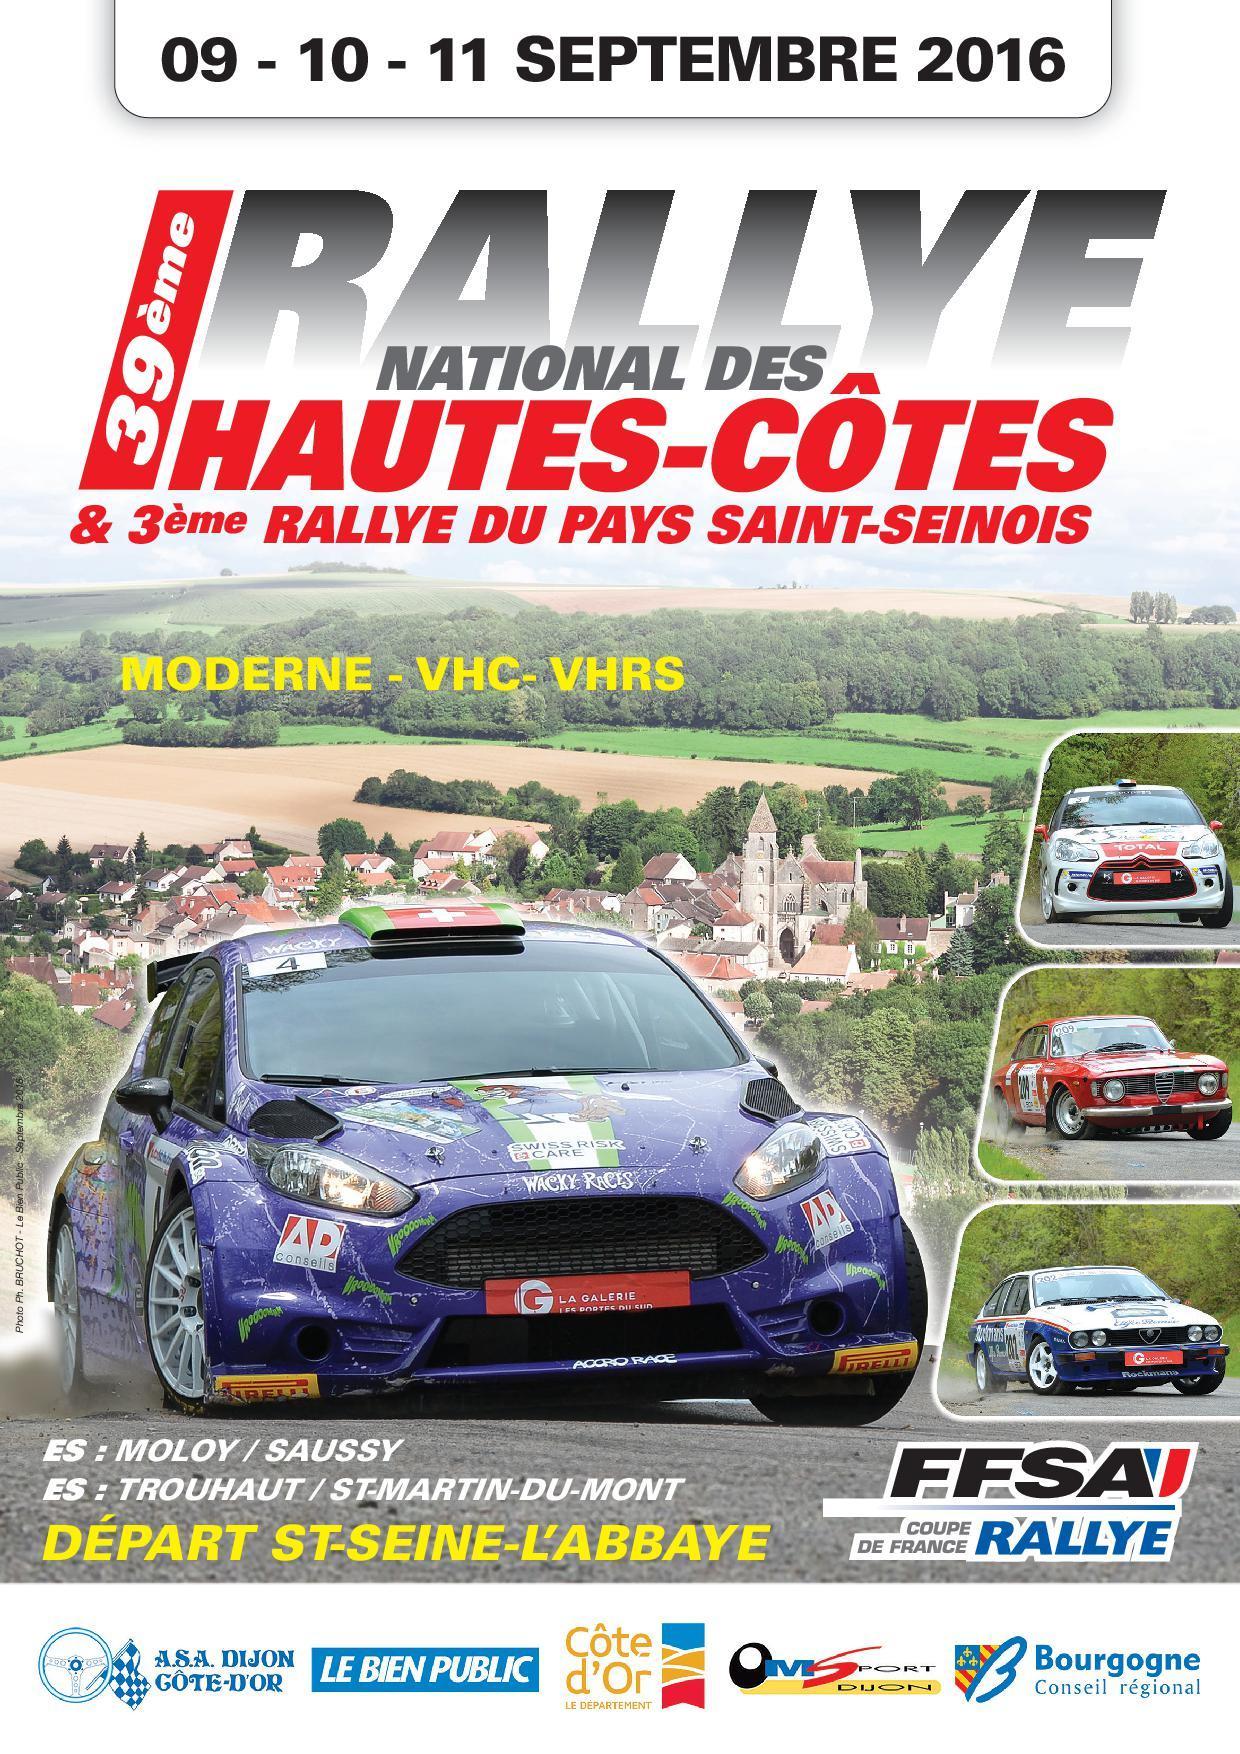 Rallye-Hautes-Cotes-2016